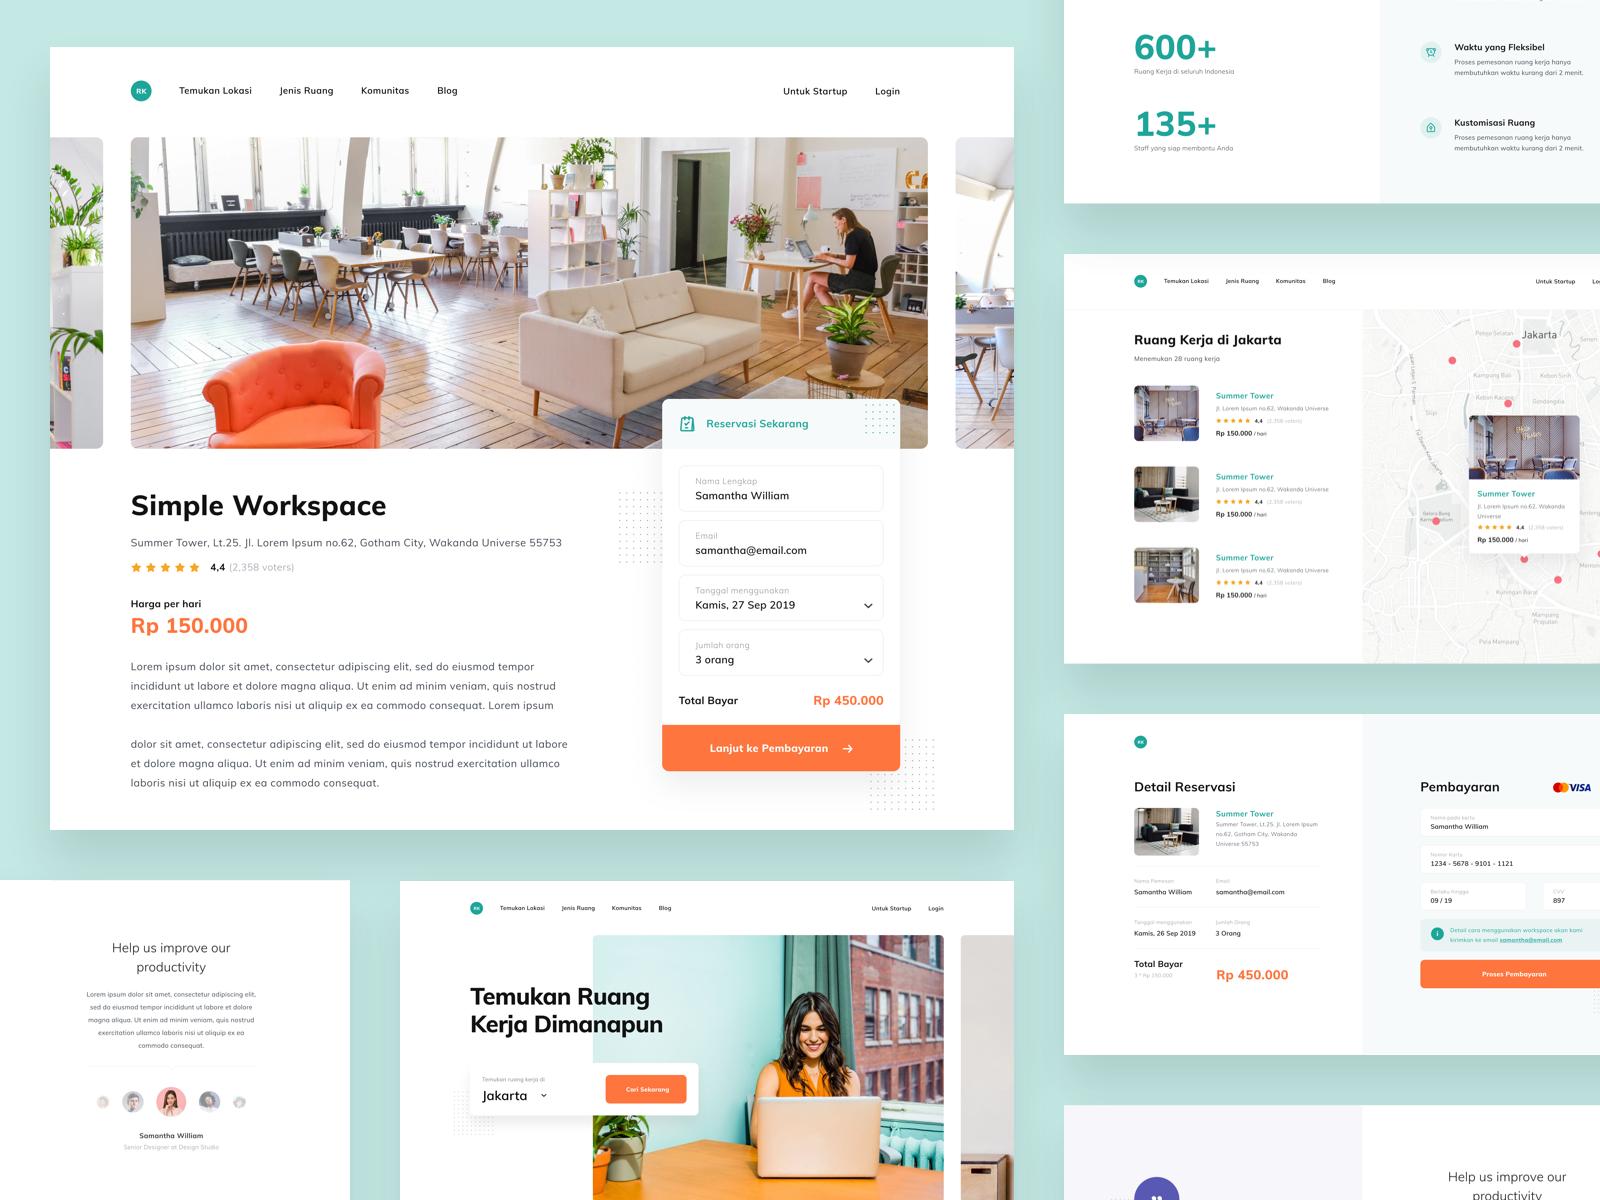 Online Course Is Coming Soon Kelasbypaperpillar In 2020 User Interface Design Interface Design Business Website Design